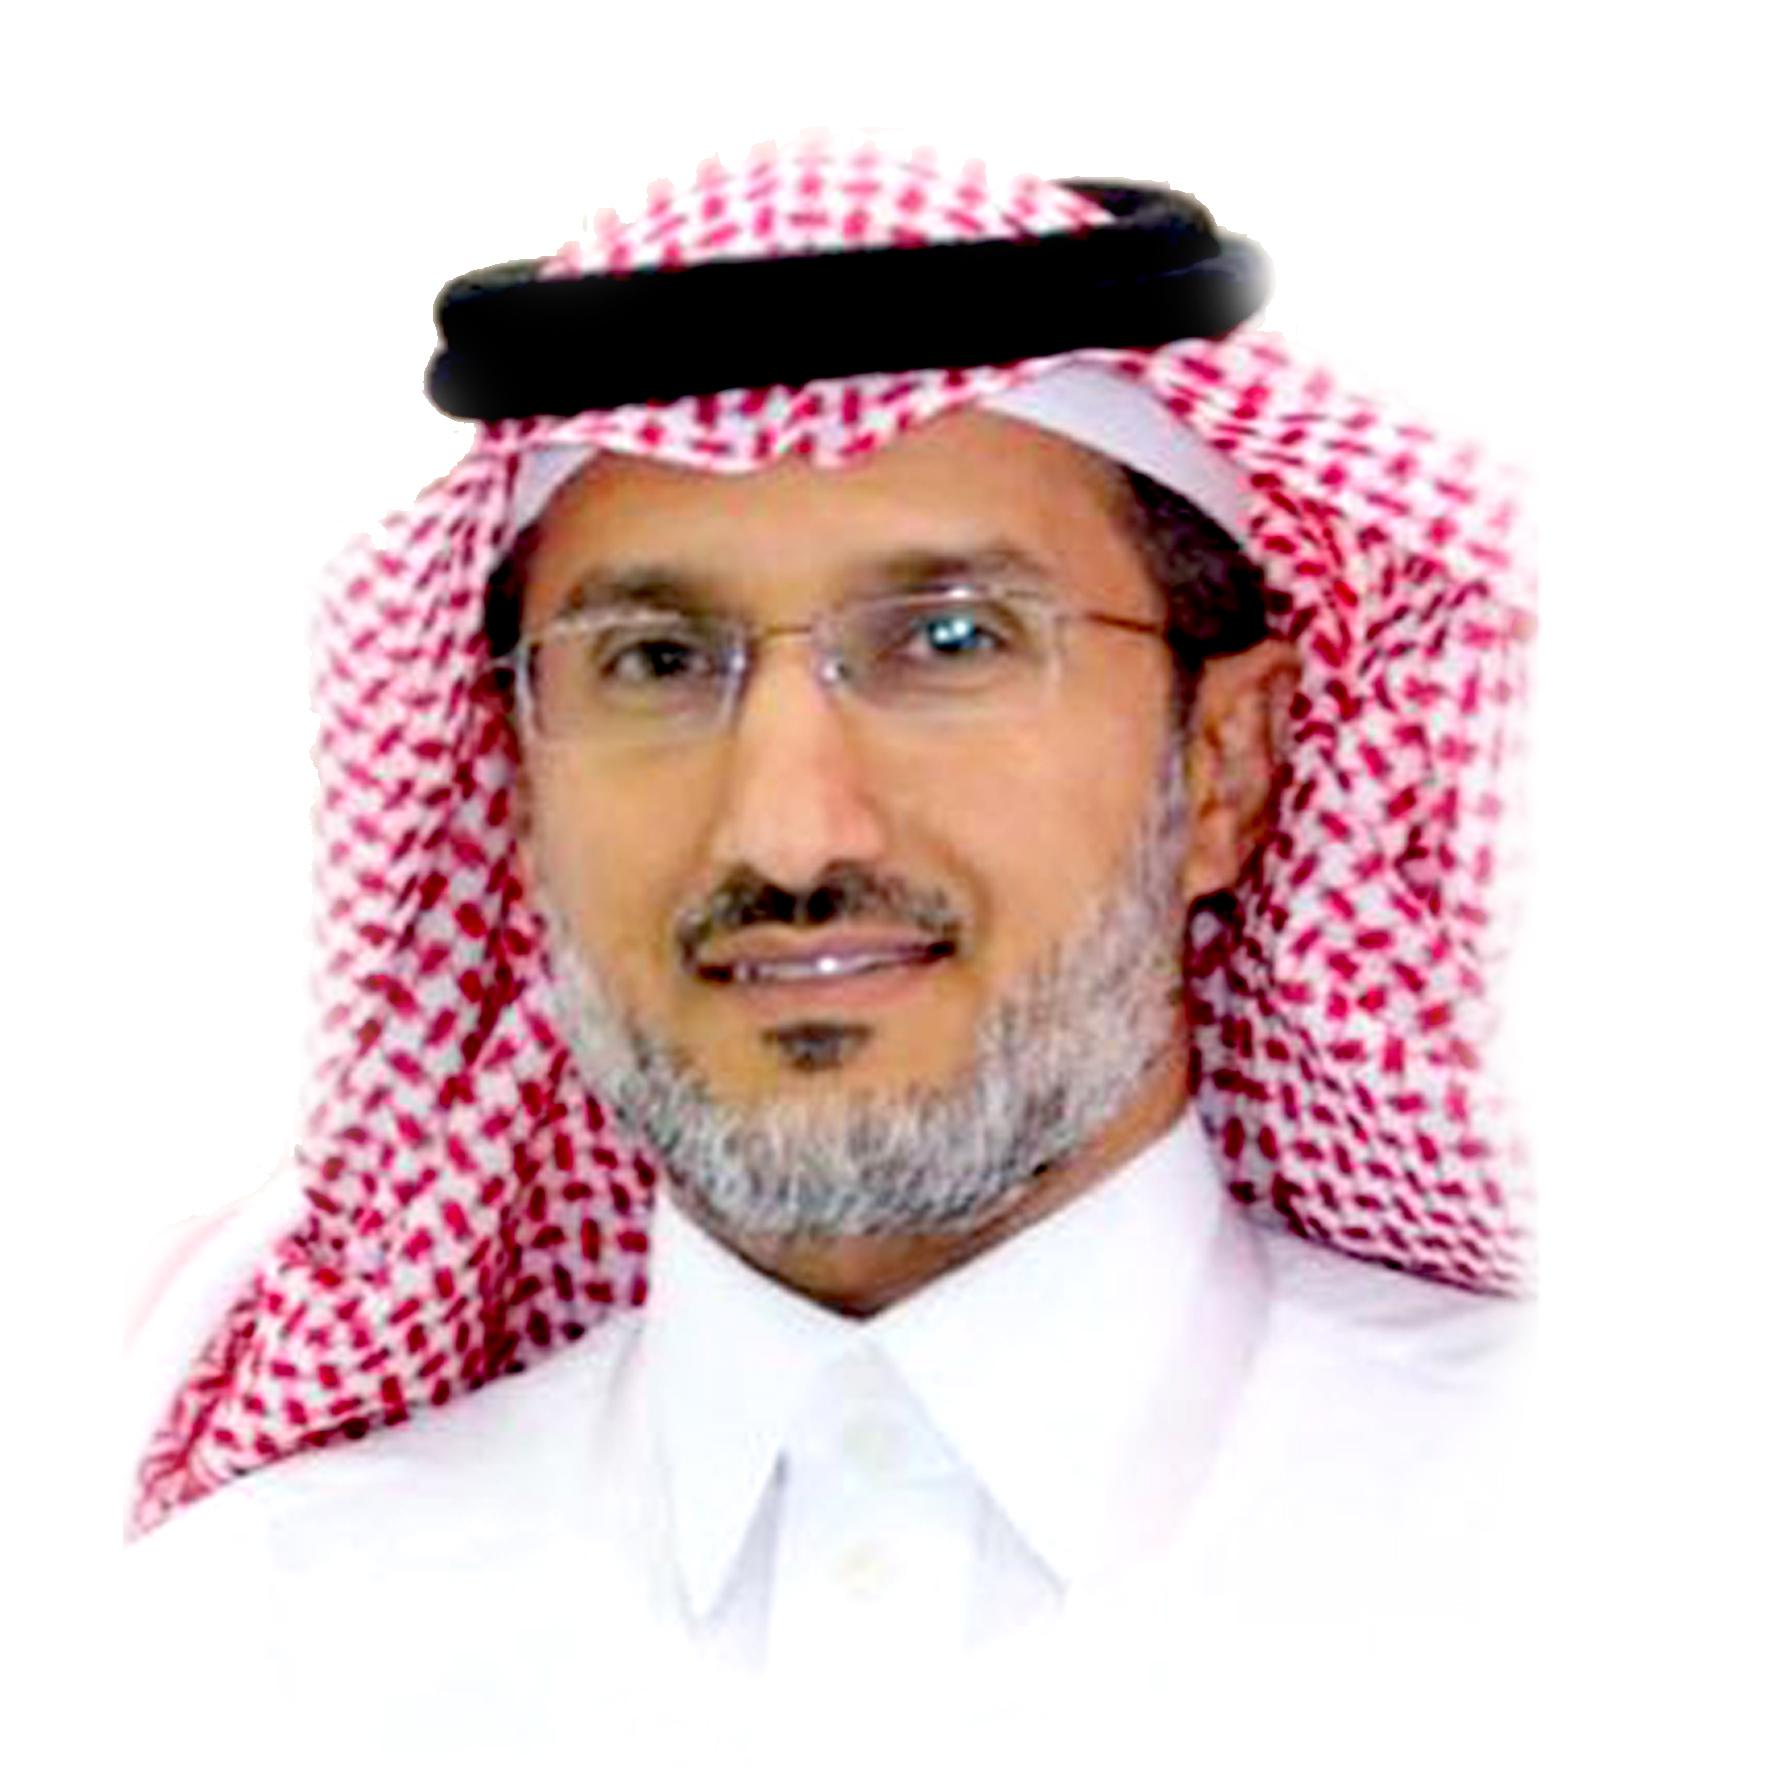 م. ماجد بن سعد الدرعان